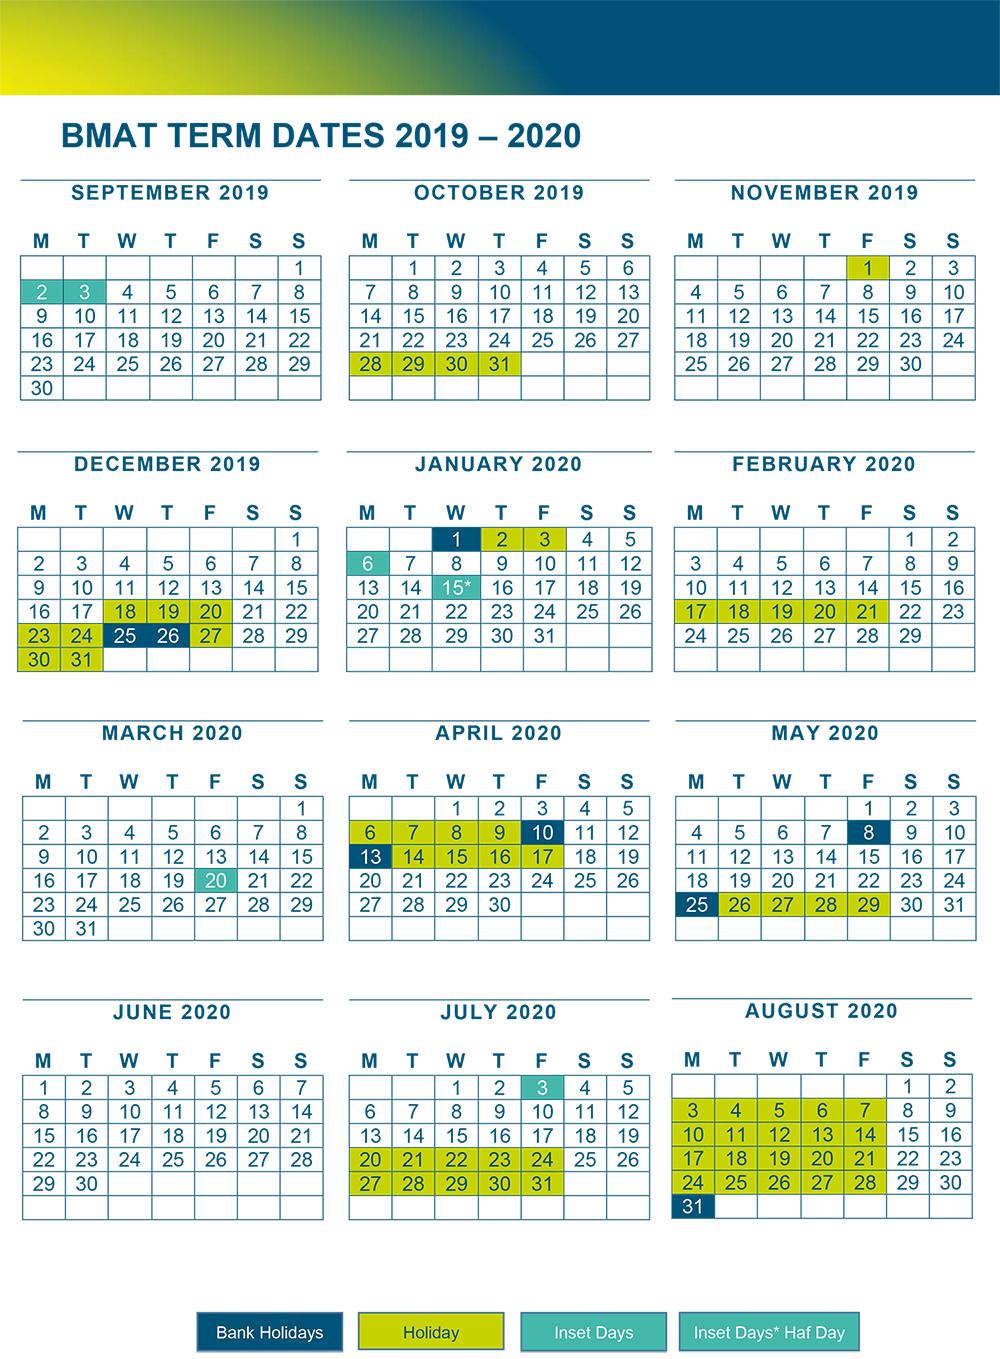 BMAT Term Dates 2019 2020